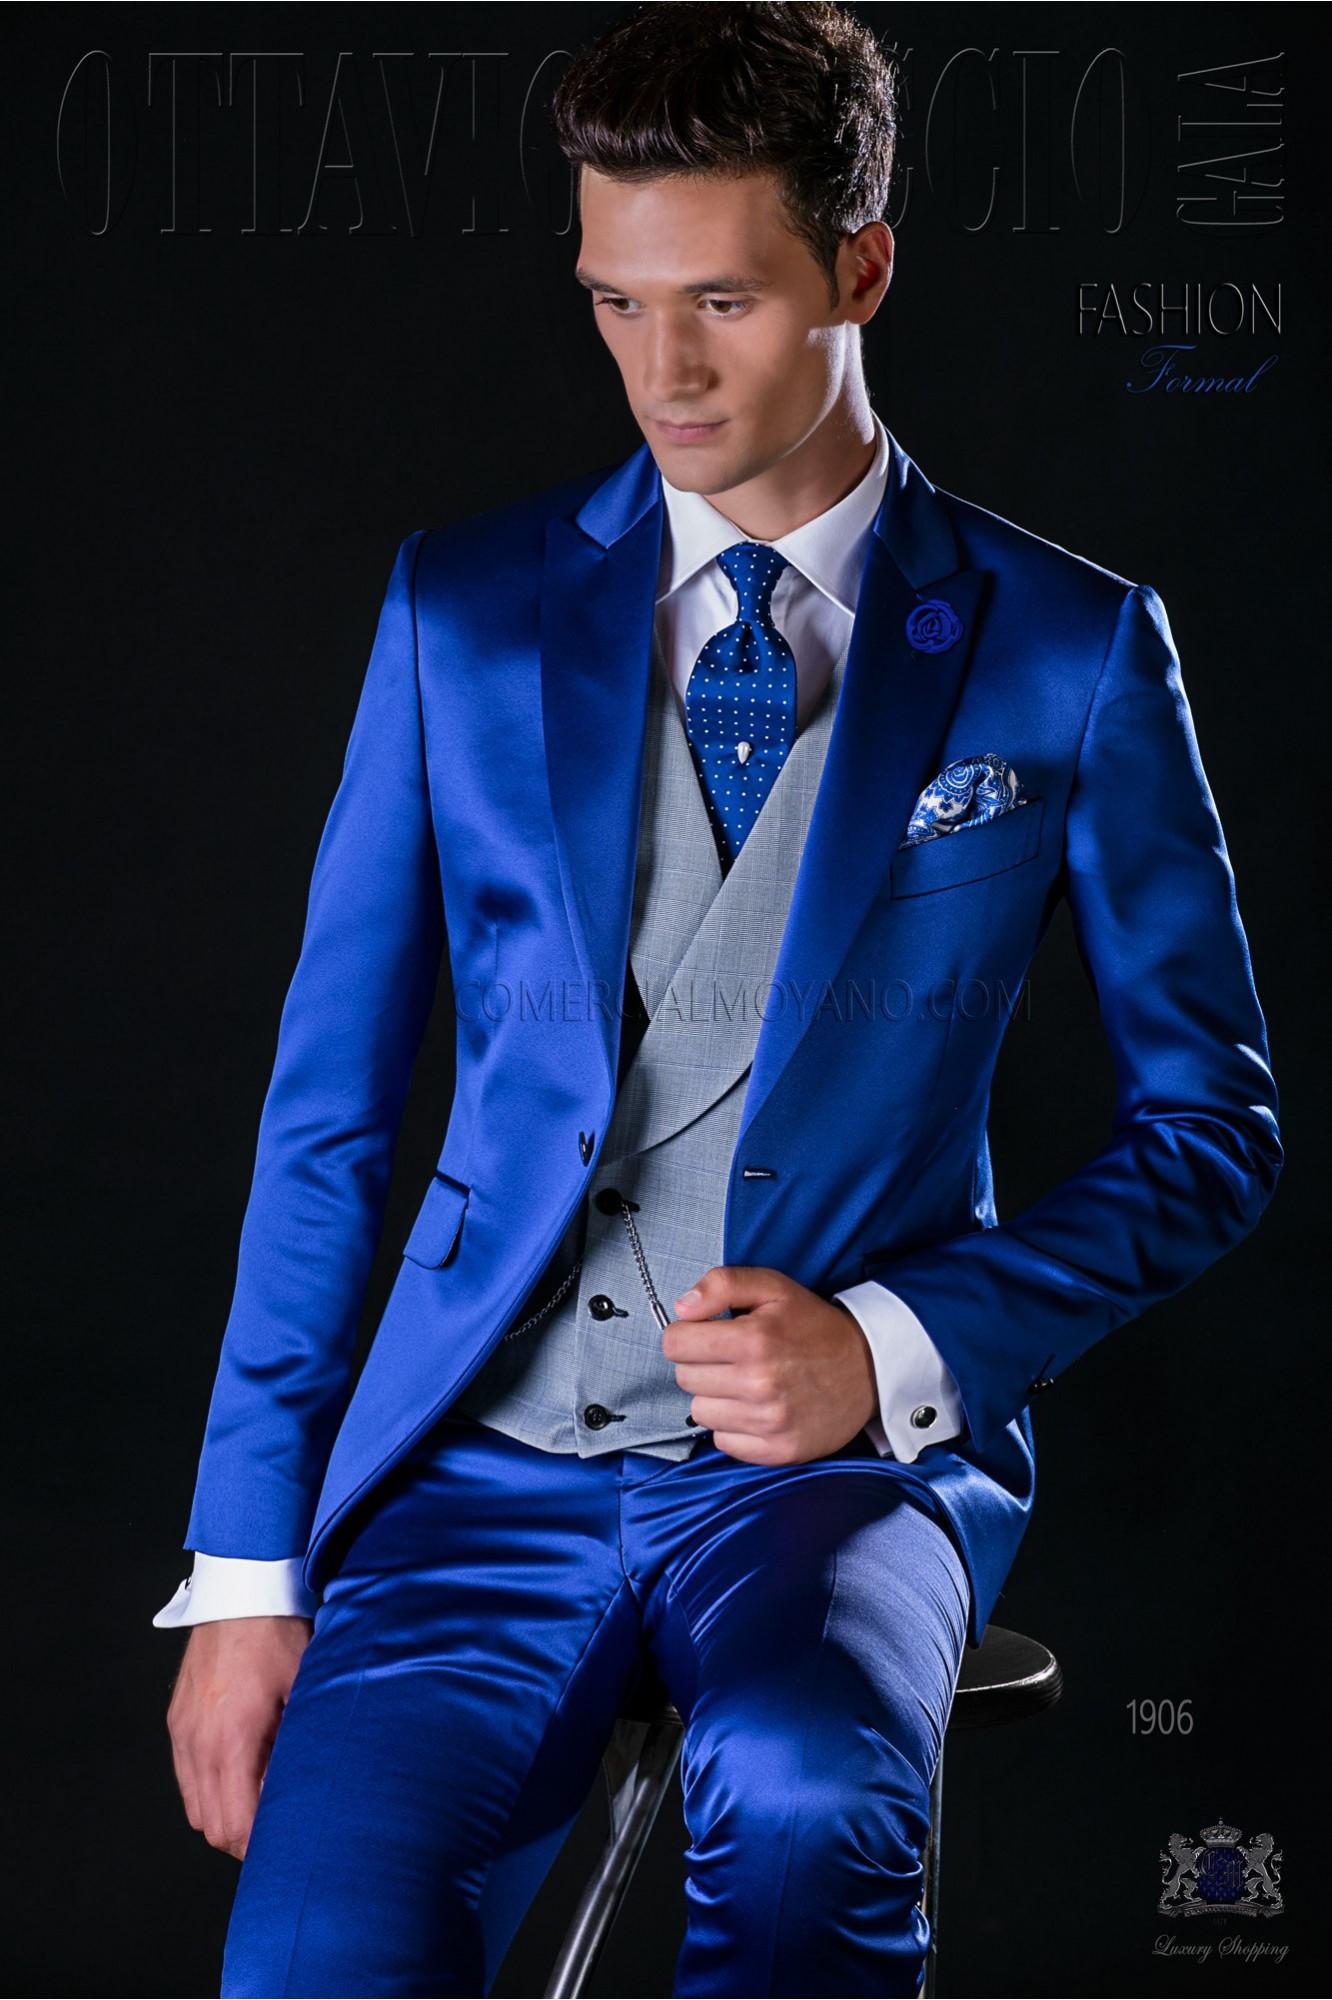 Traje de novio moderno azul eléctrico de raso modelo: 1906 Ottavio Nuccio Gala colección Fashion